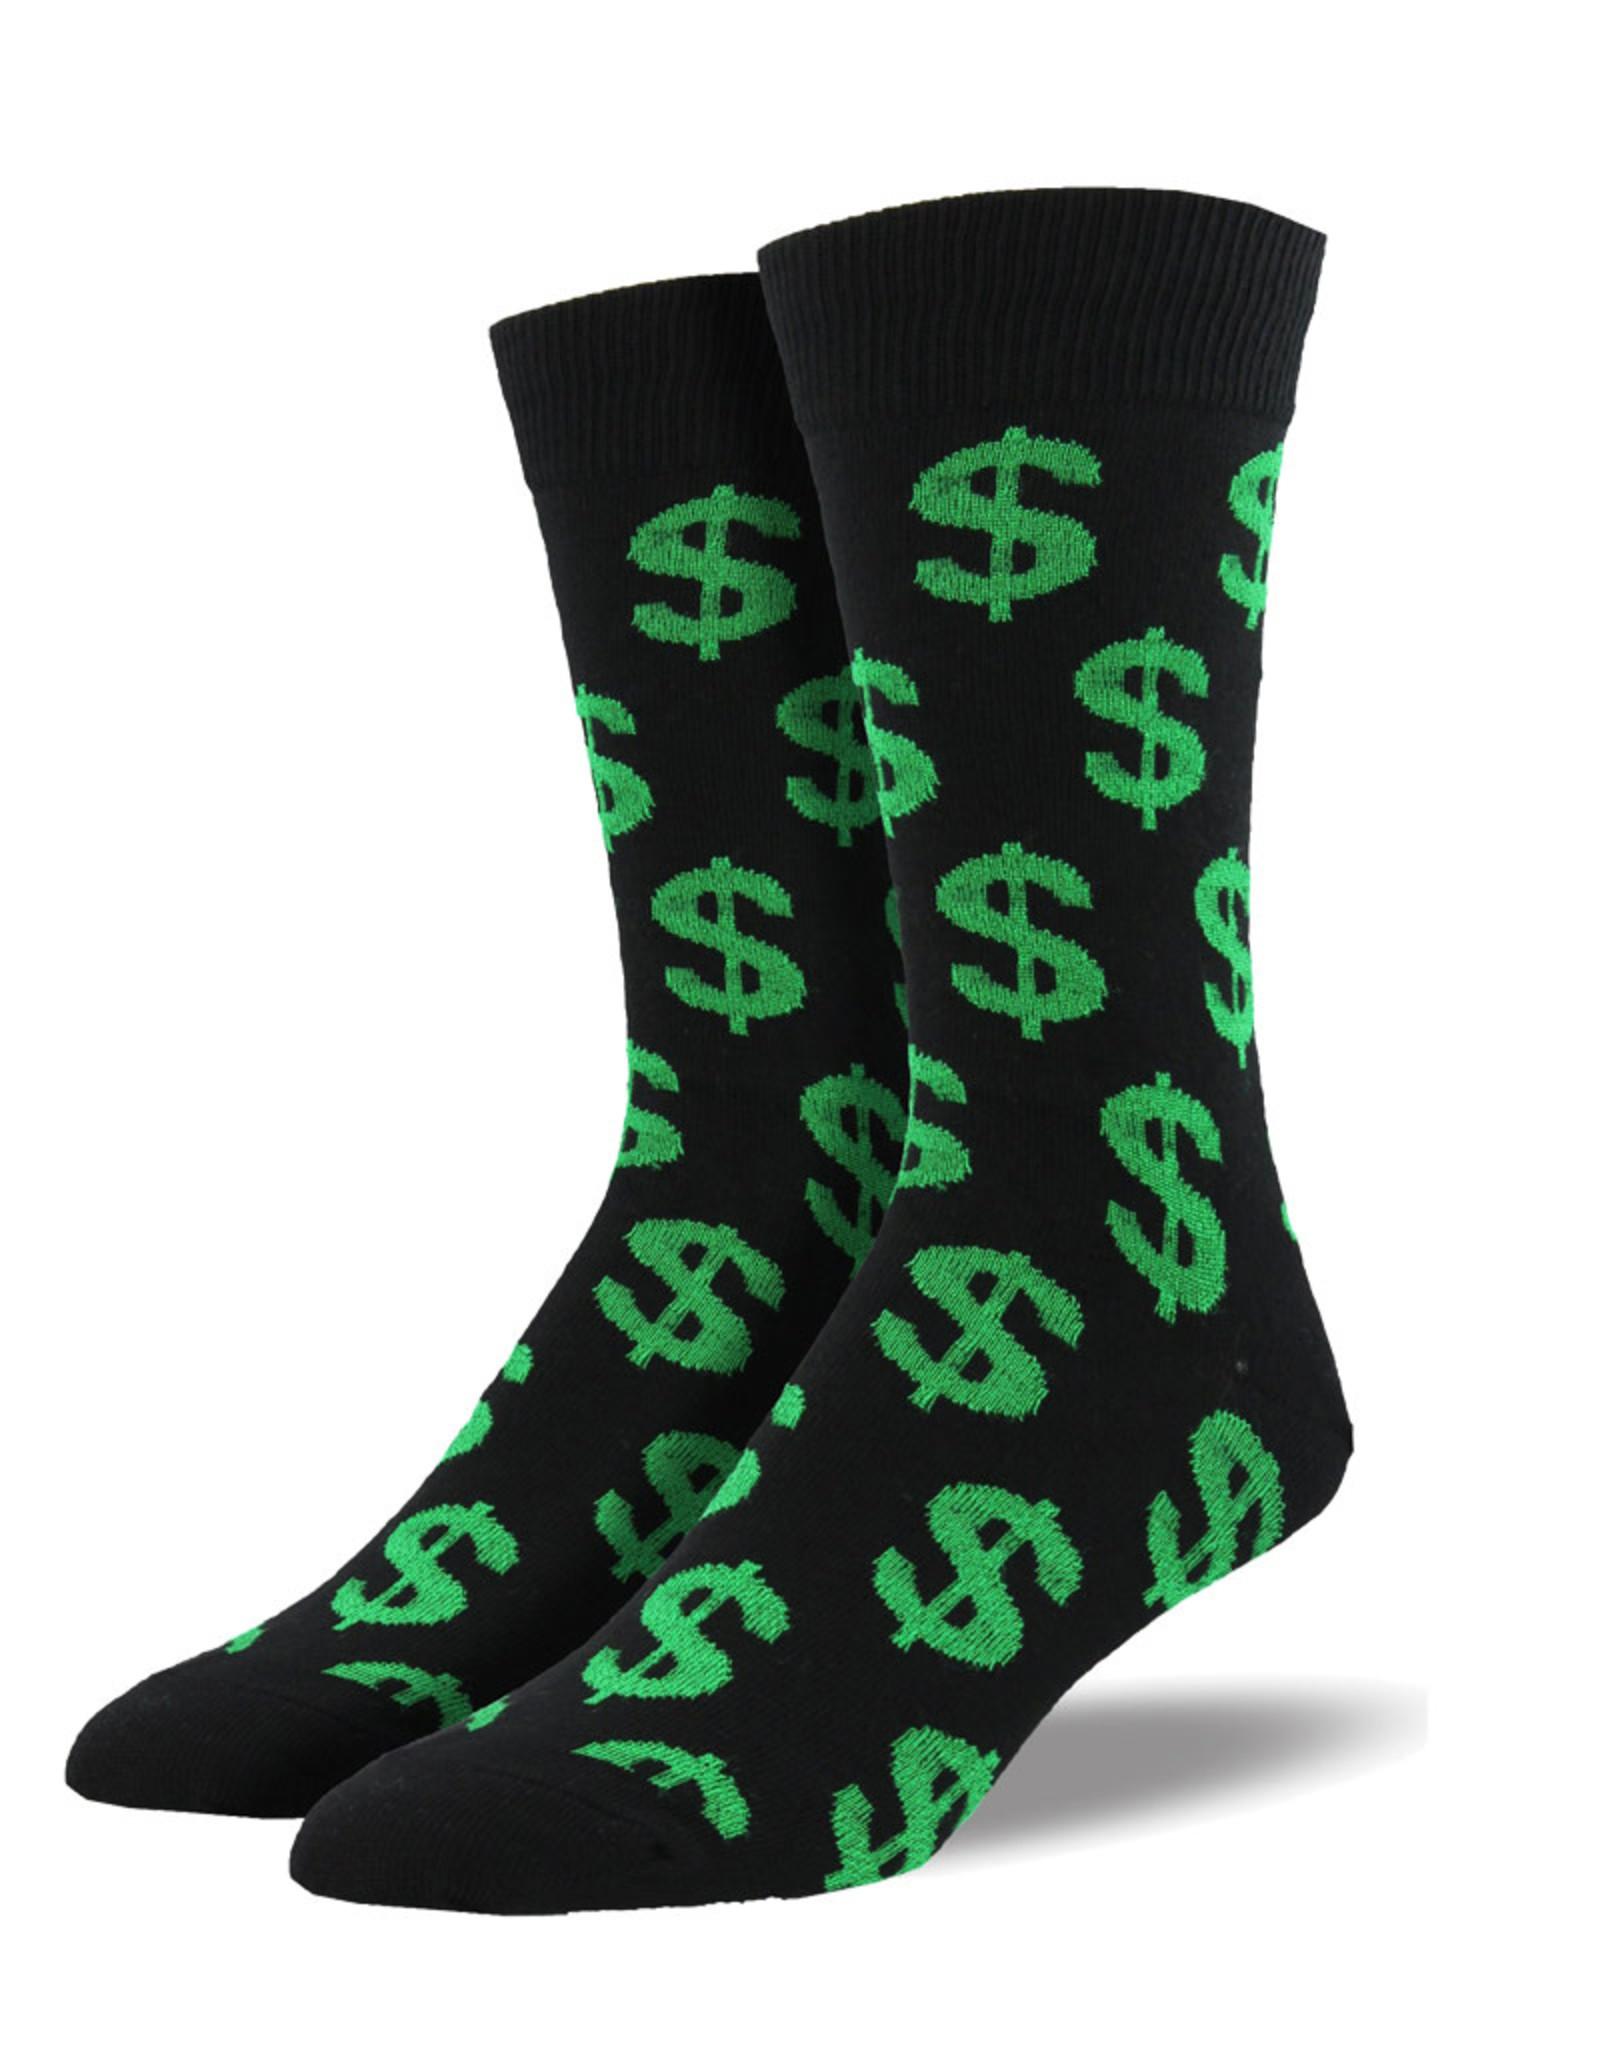 Money ( Socksmith Sock )